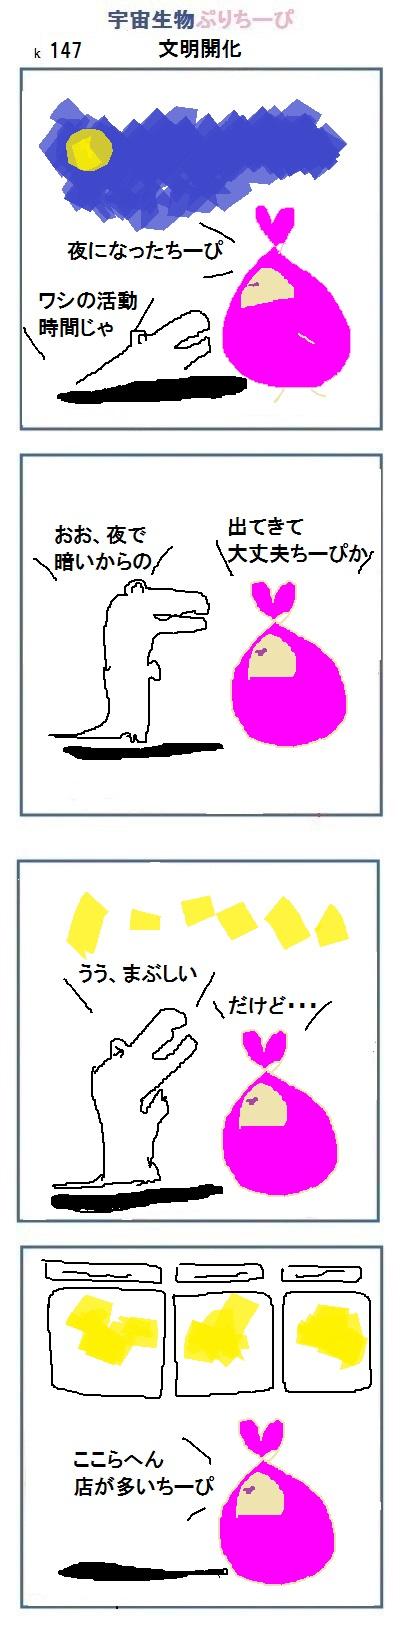 161027_k144.jpg